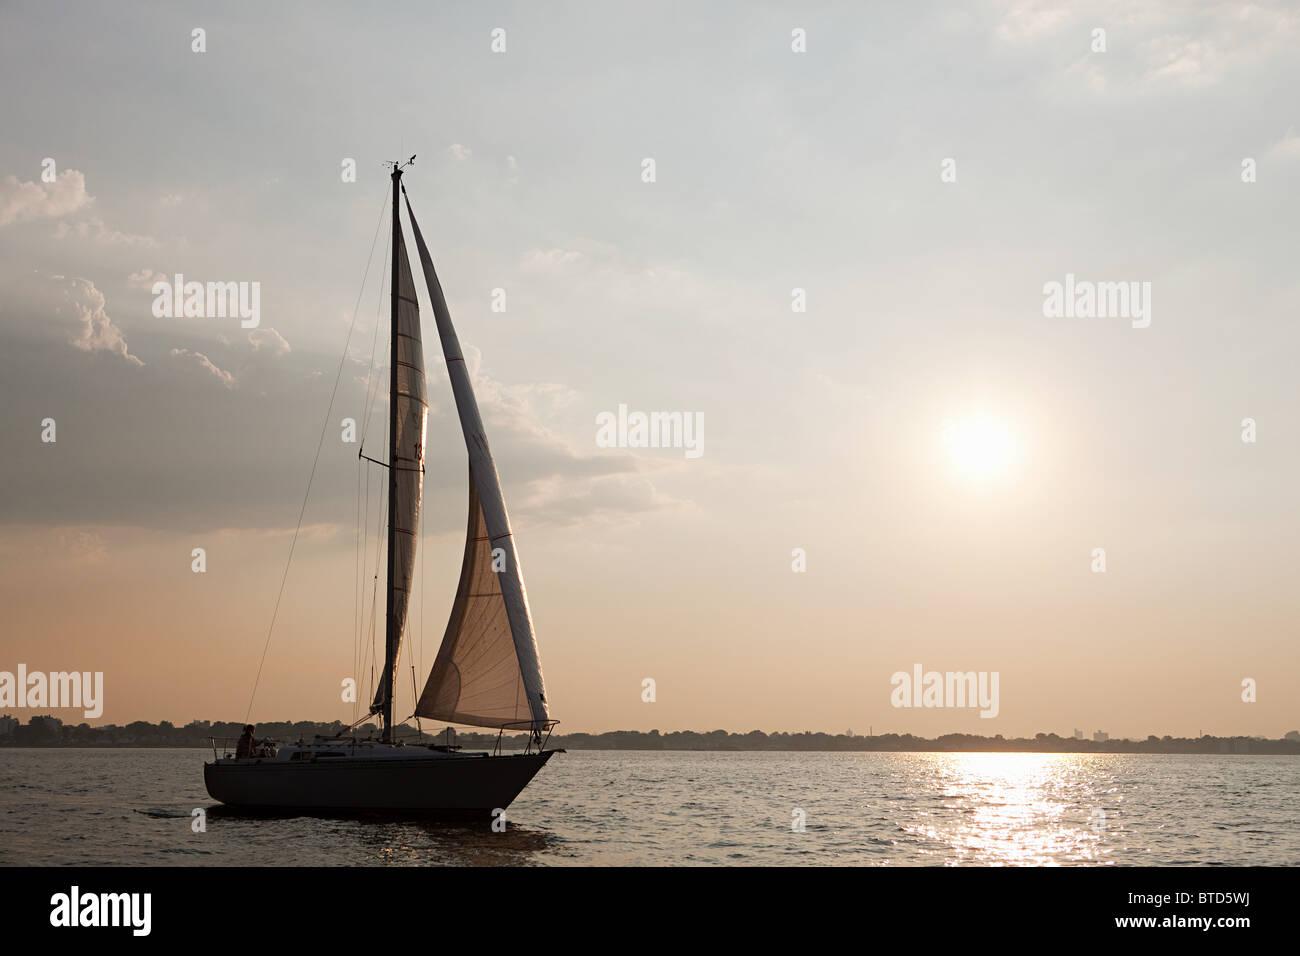 Yacht sailing on sea at dusk - Stock Image